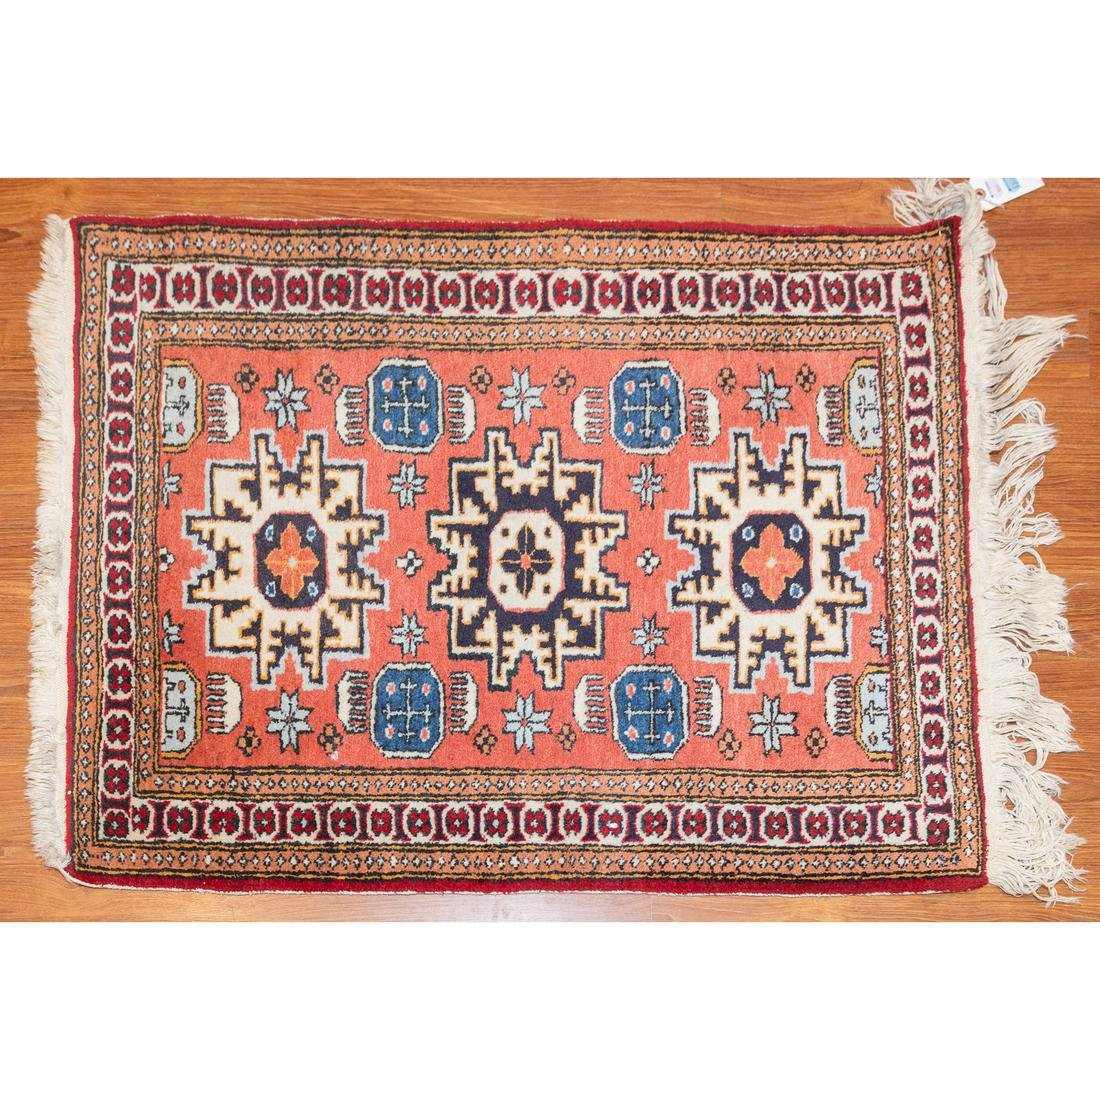 Ardebil Rug, Persia, 2.7 x 3.5